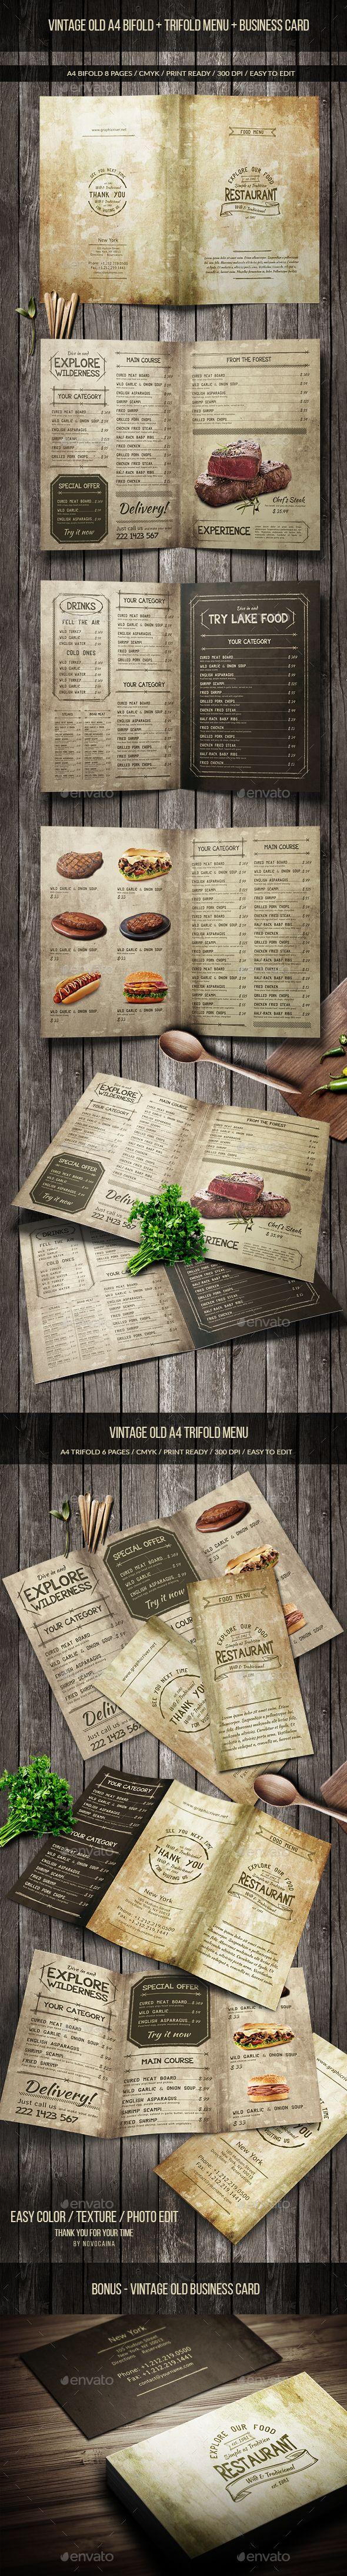 Vintage Old Menu Pack  — PSD Template #drinks menu #retro • Download ➝ https://graphicriver.net/item/vintage-old-menu-pack/18517760?ref=pxcr